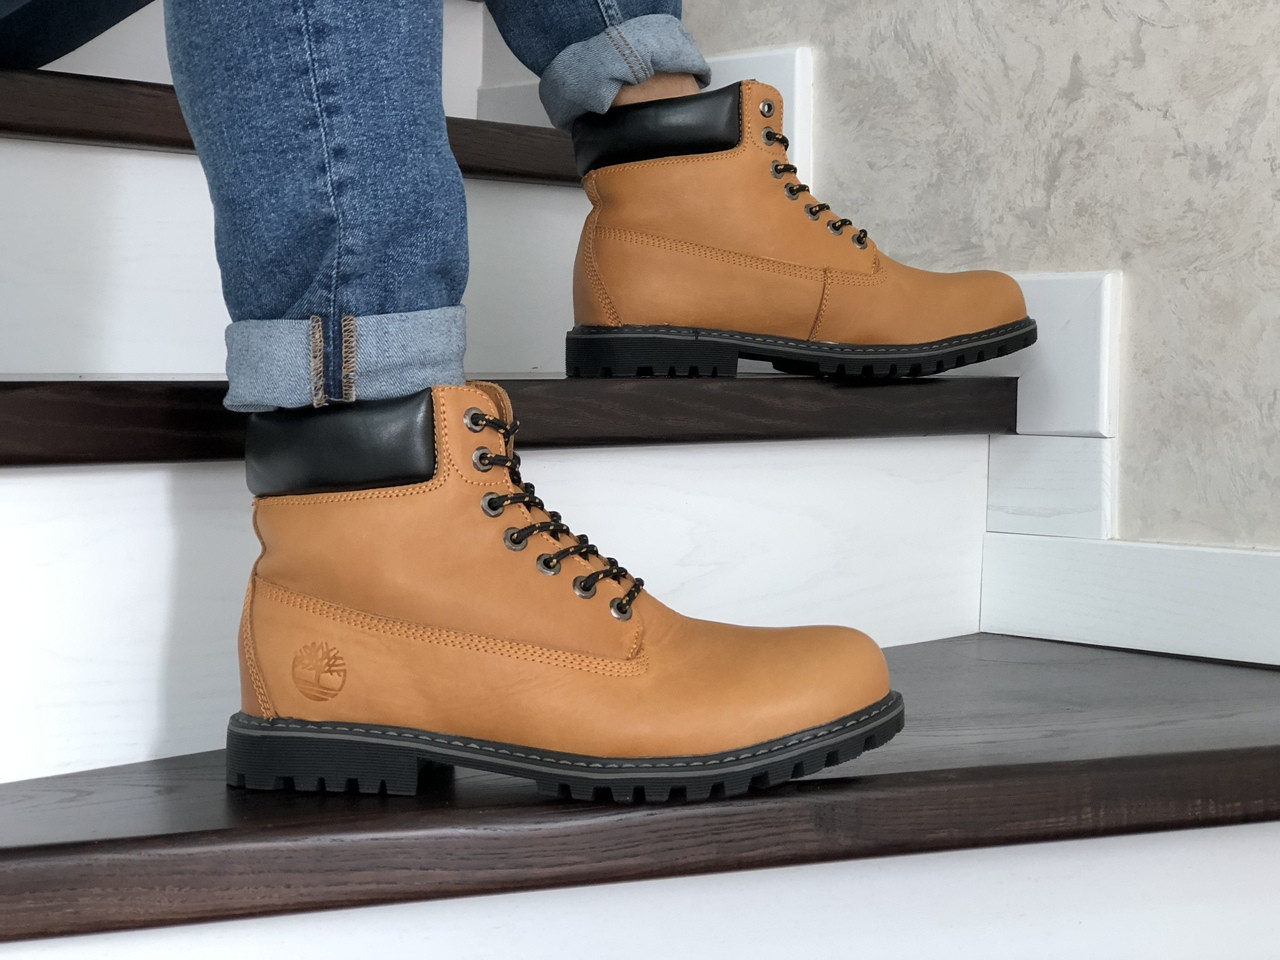 Мужские зимние ботинки Timberland,Тимберленд,рыжие